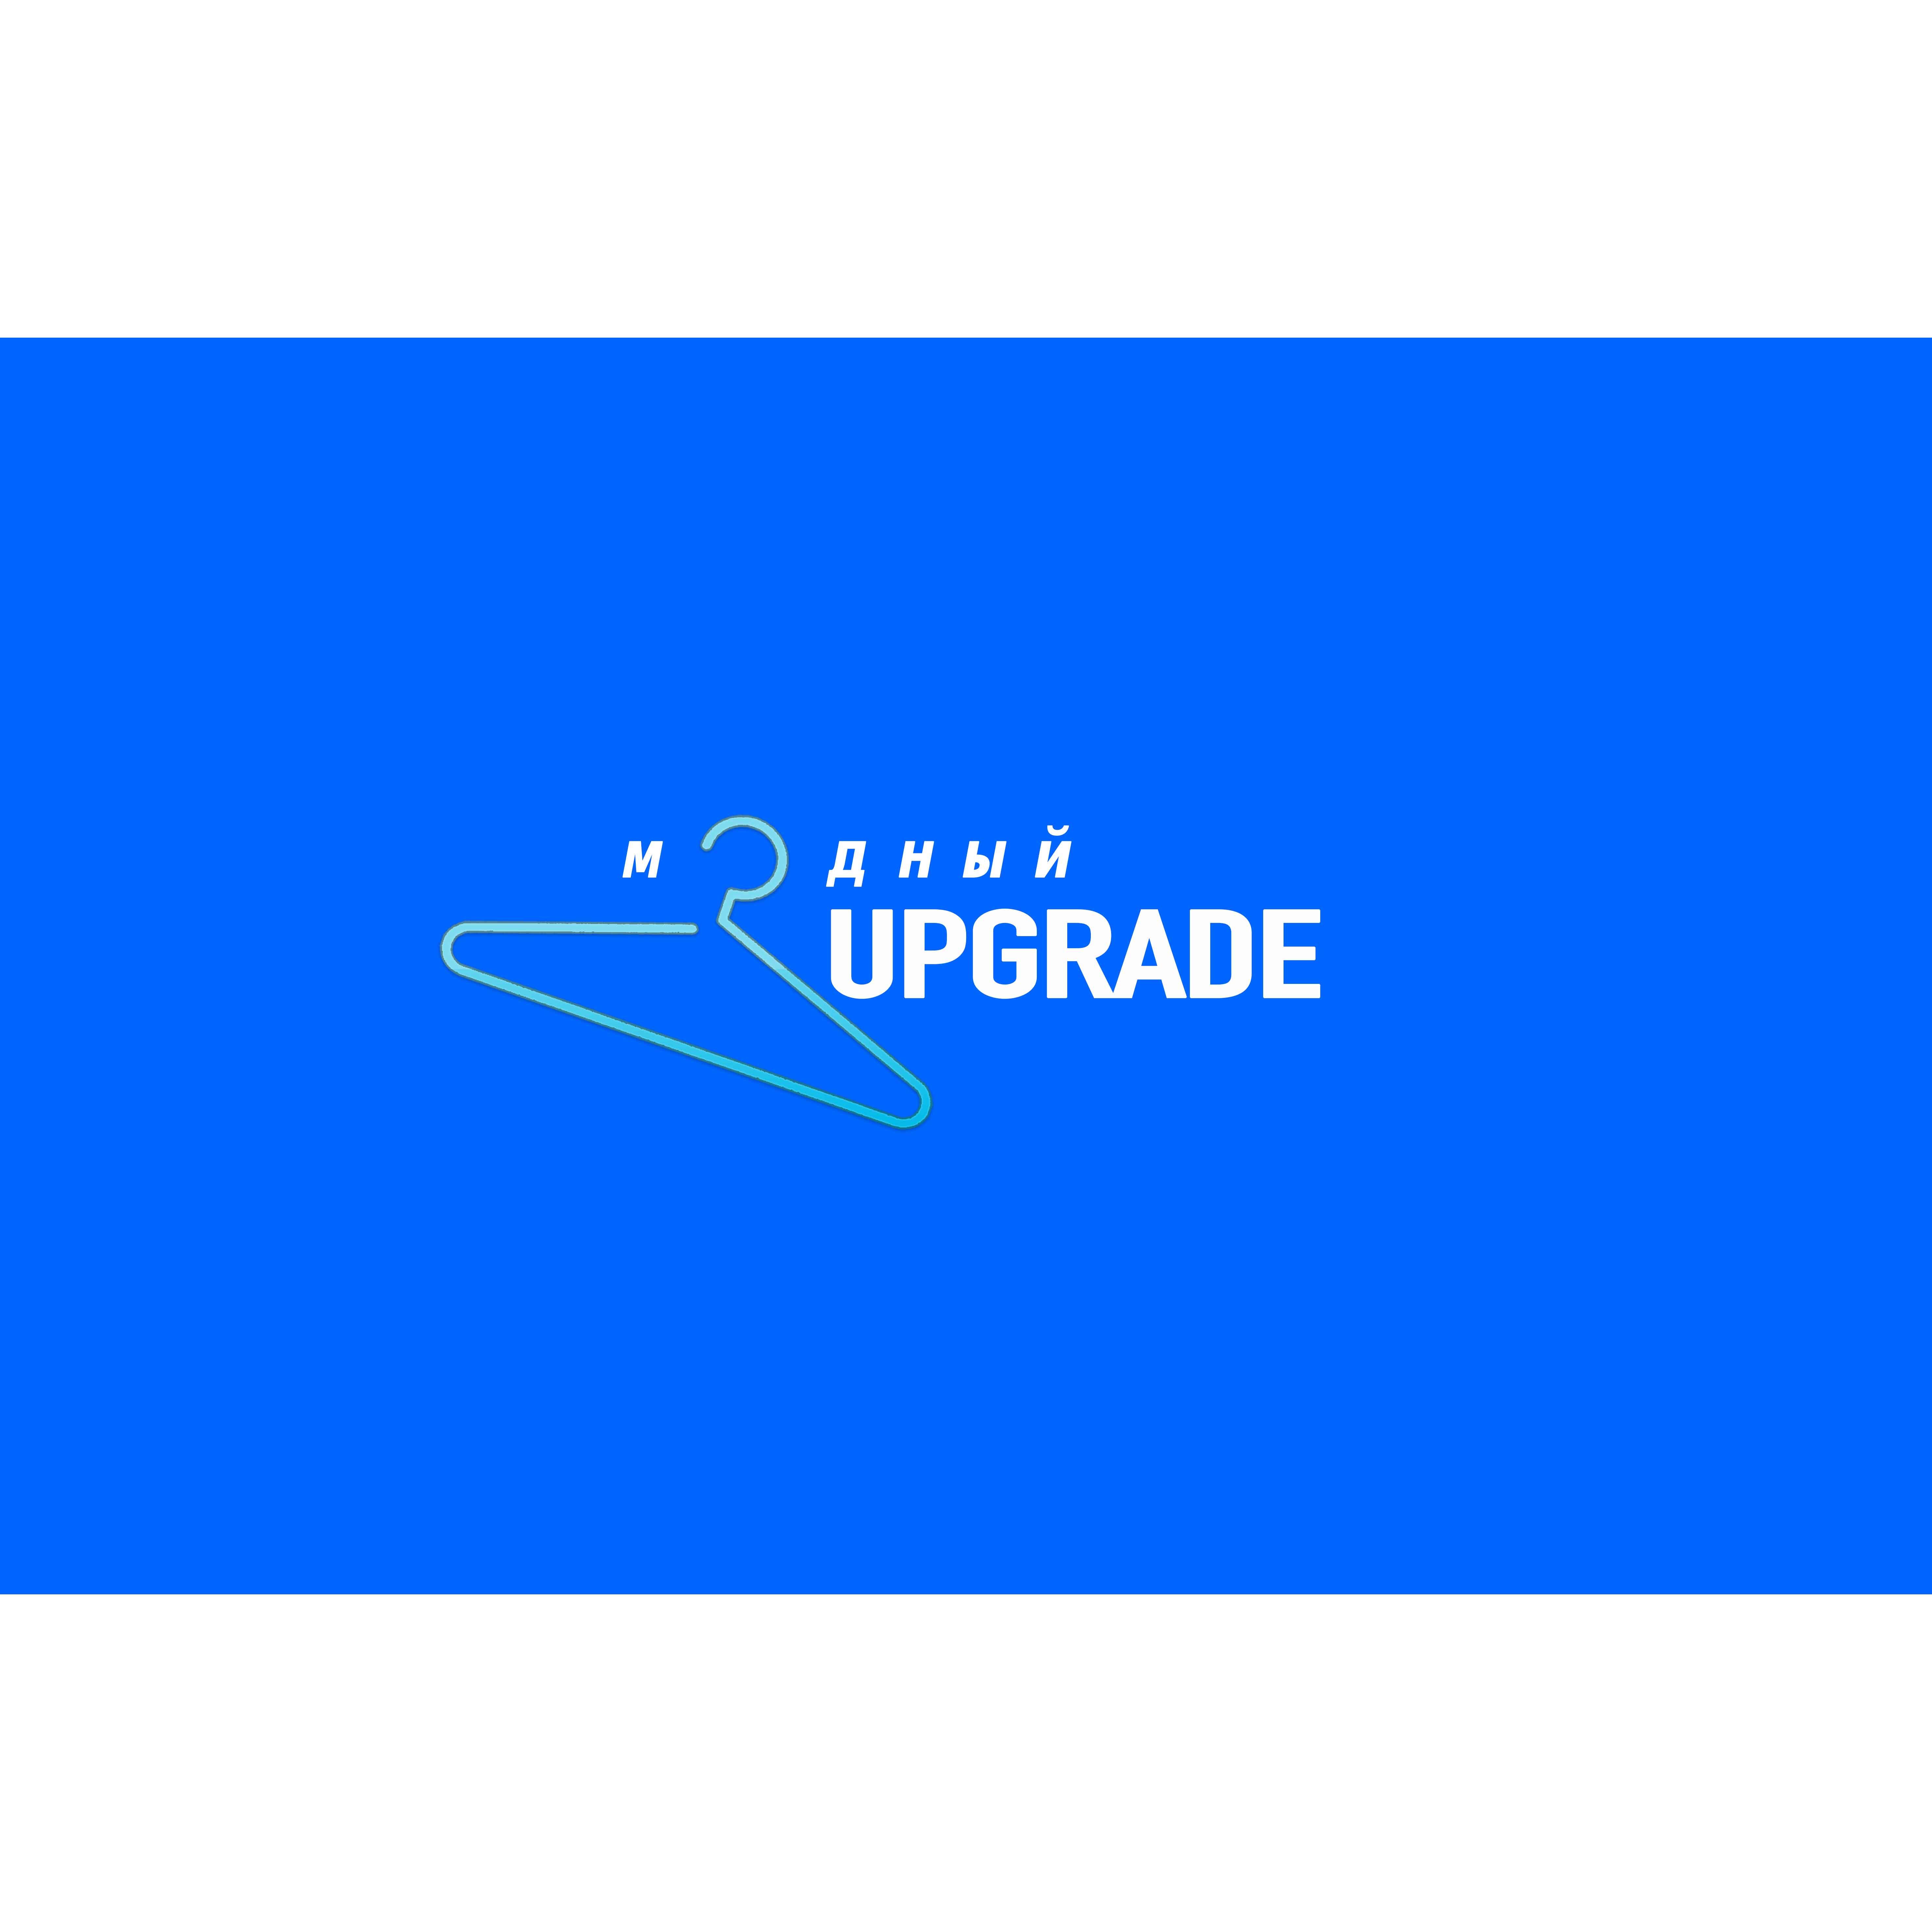 "Логотип интернет магазина ""Модный UPGRADE"" фото f_959594936bd78c15.jpg"